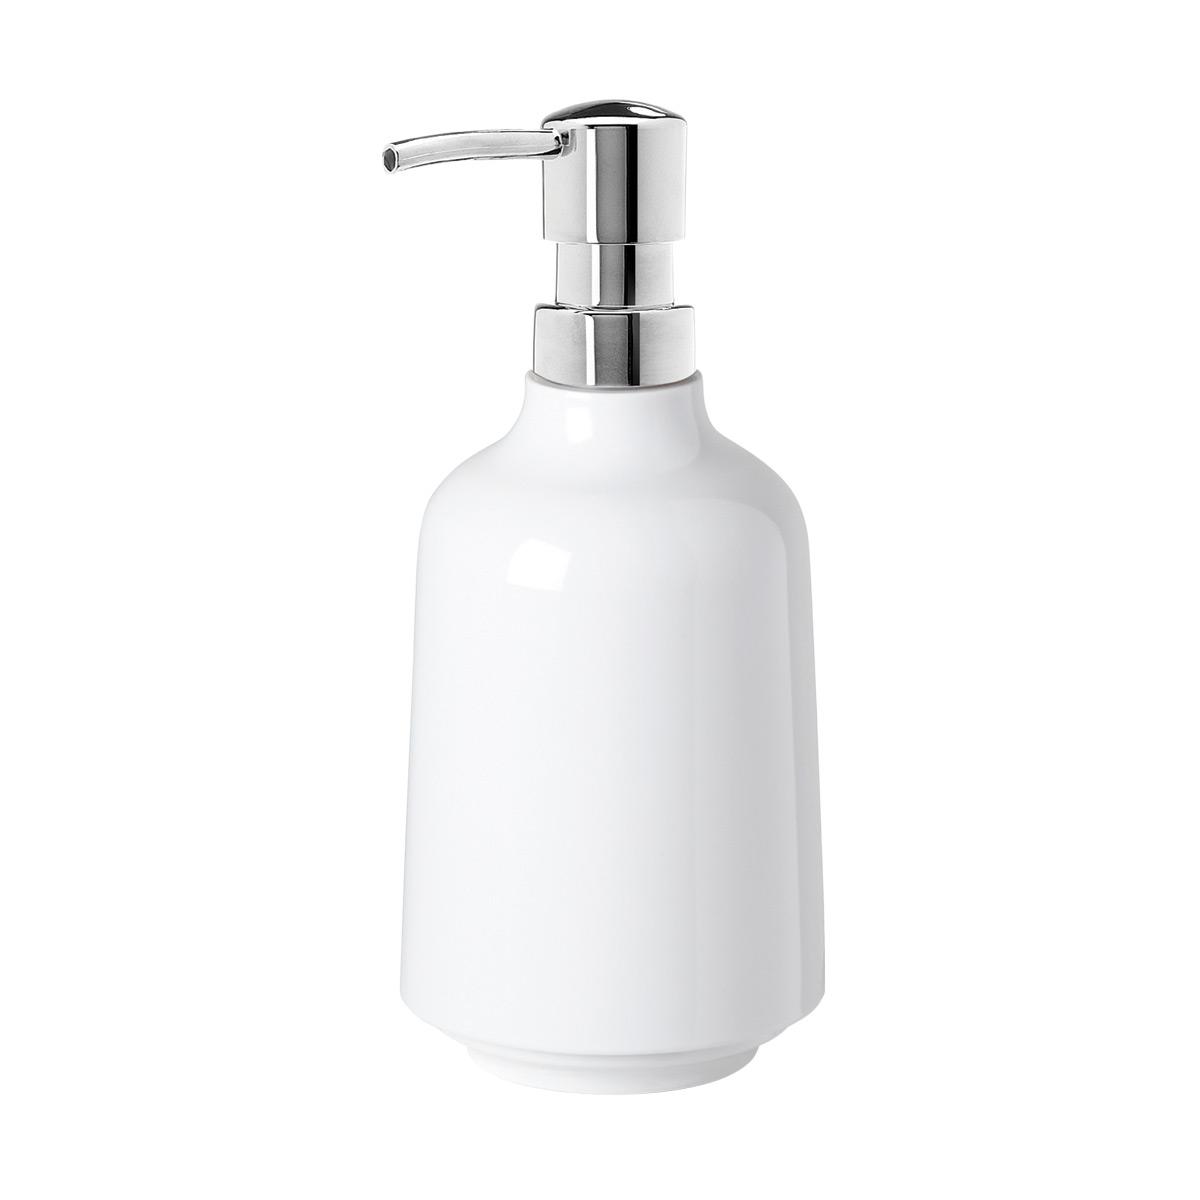 Step Soap Pump Dispenser